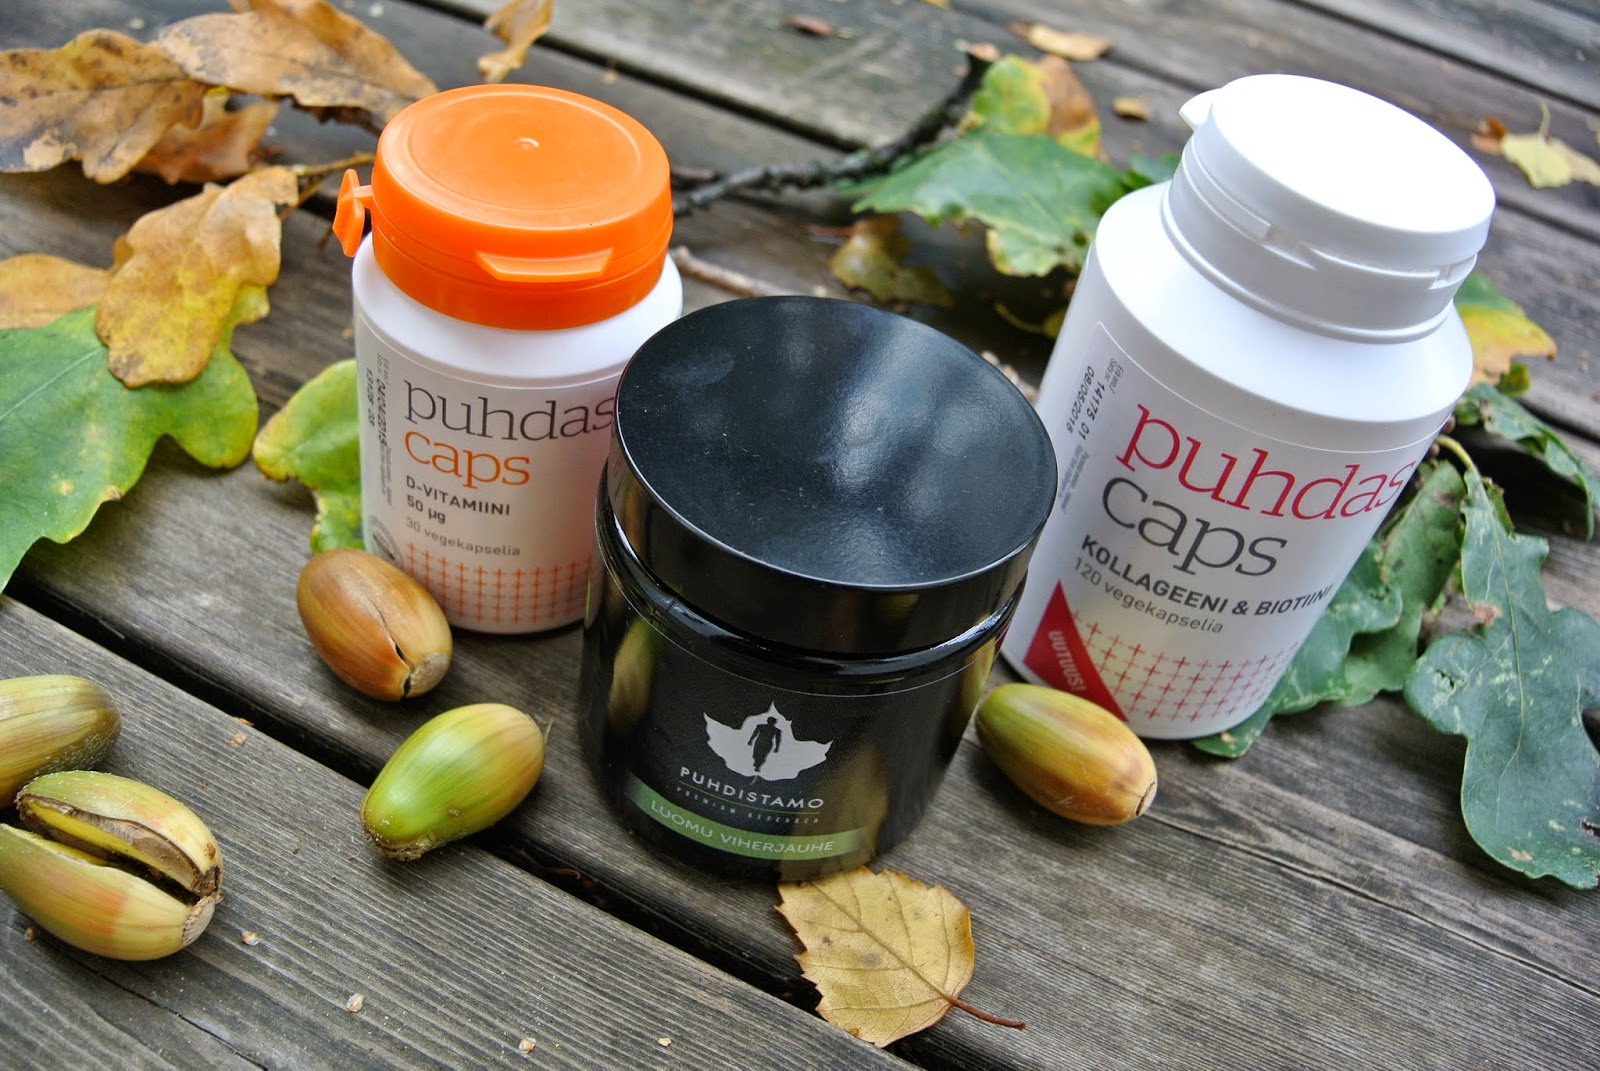 Boost your immunity- vitamiiniarvontaa!